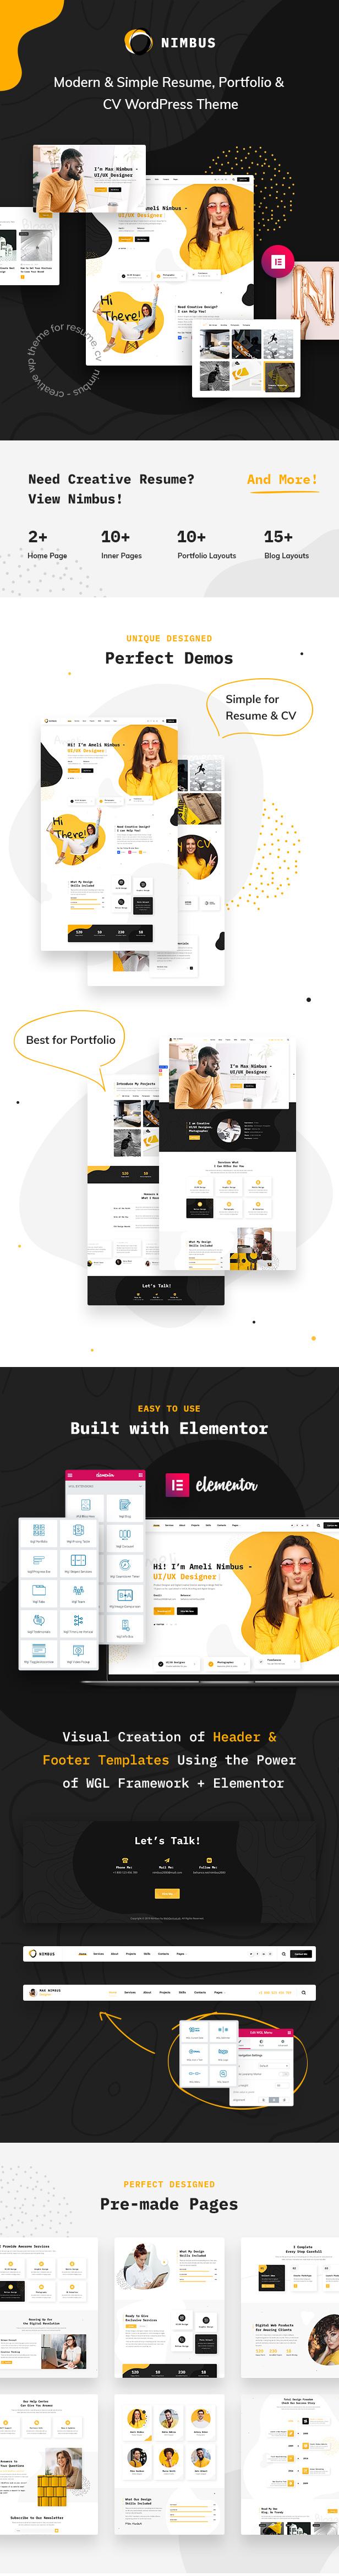 Nimbus - CV & Portfolio WordPress Theme - 1